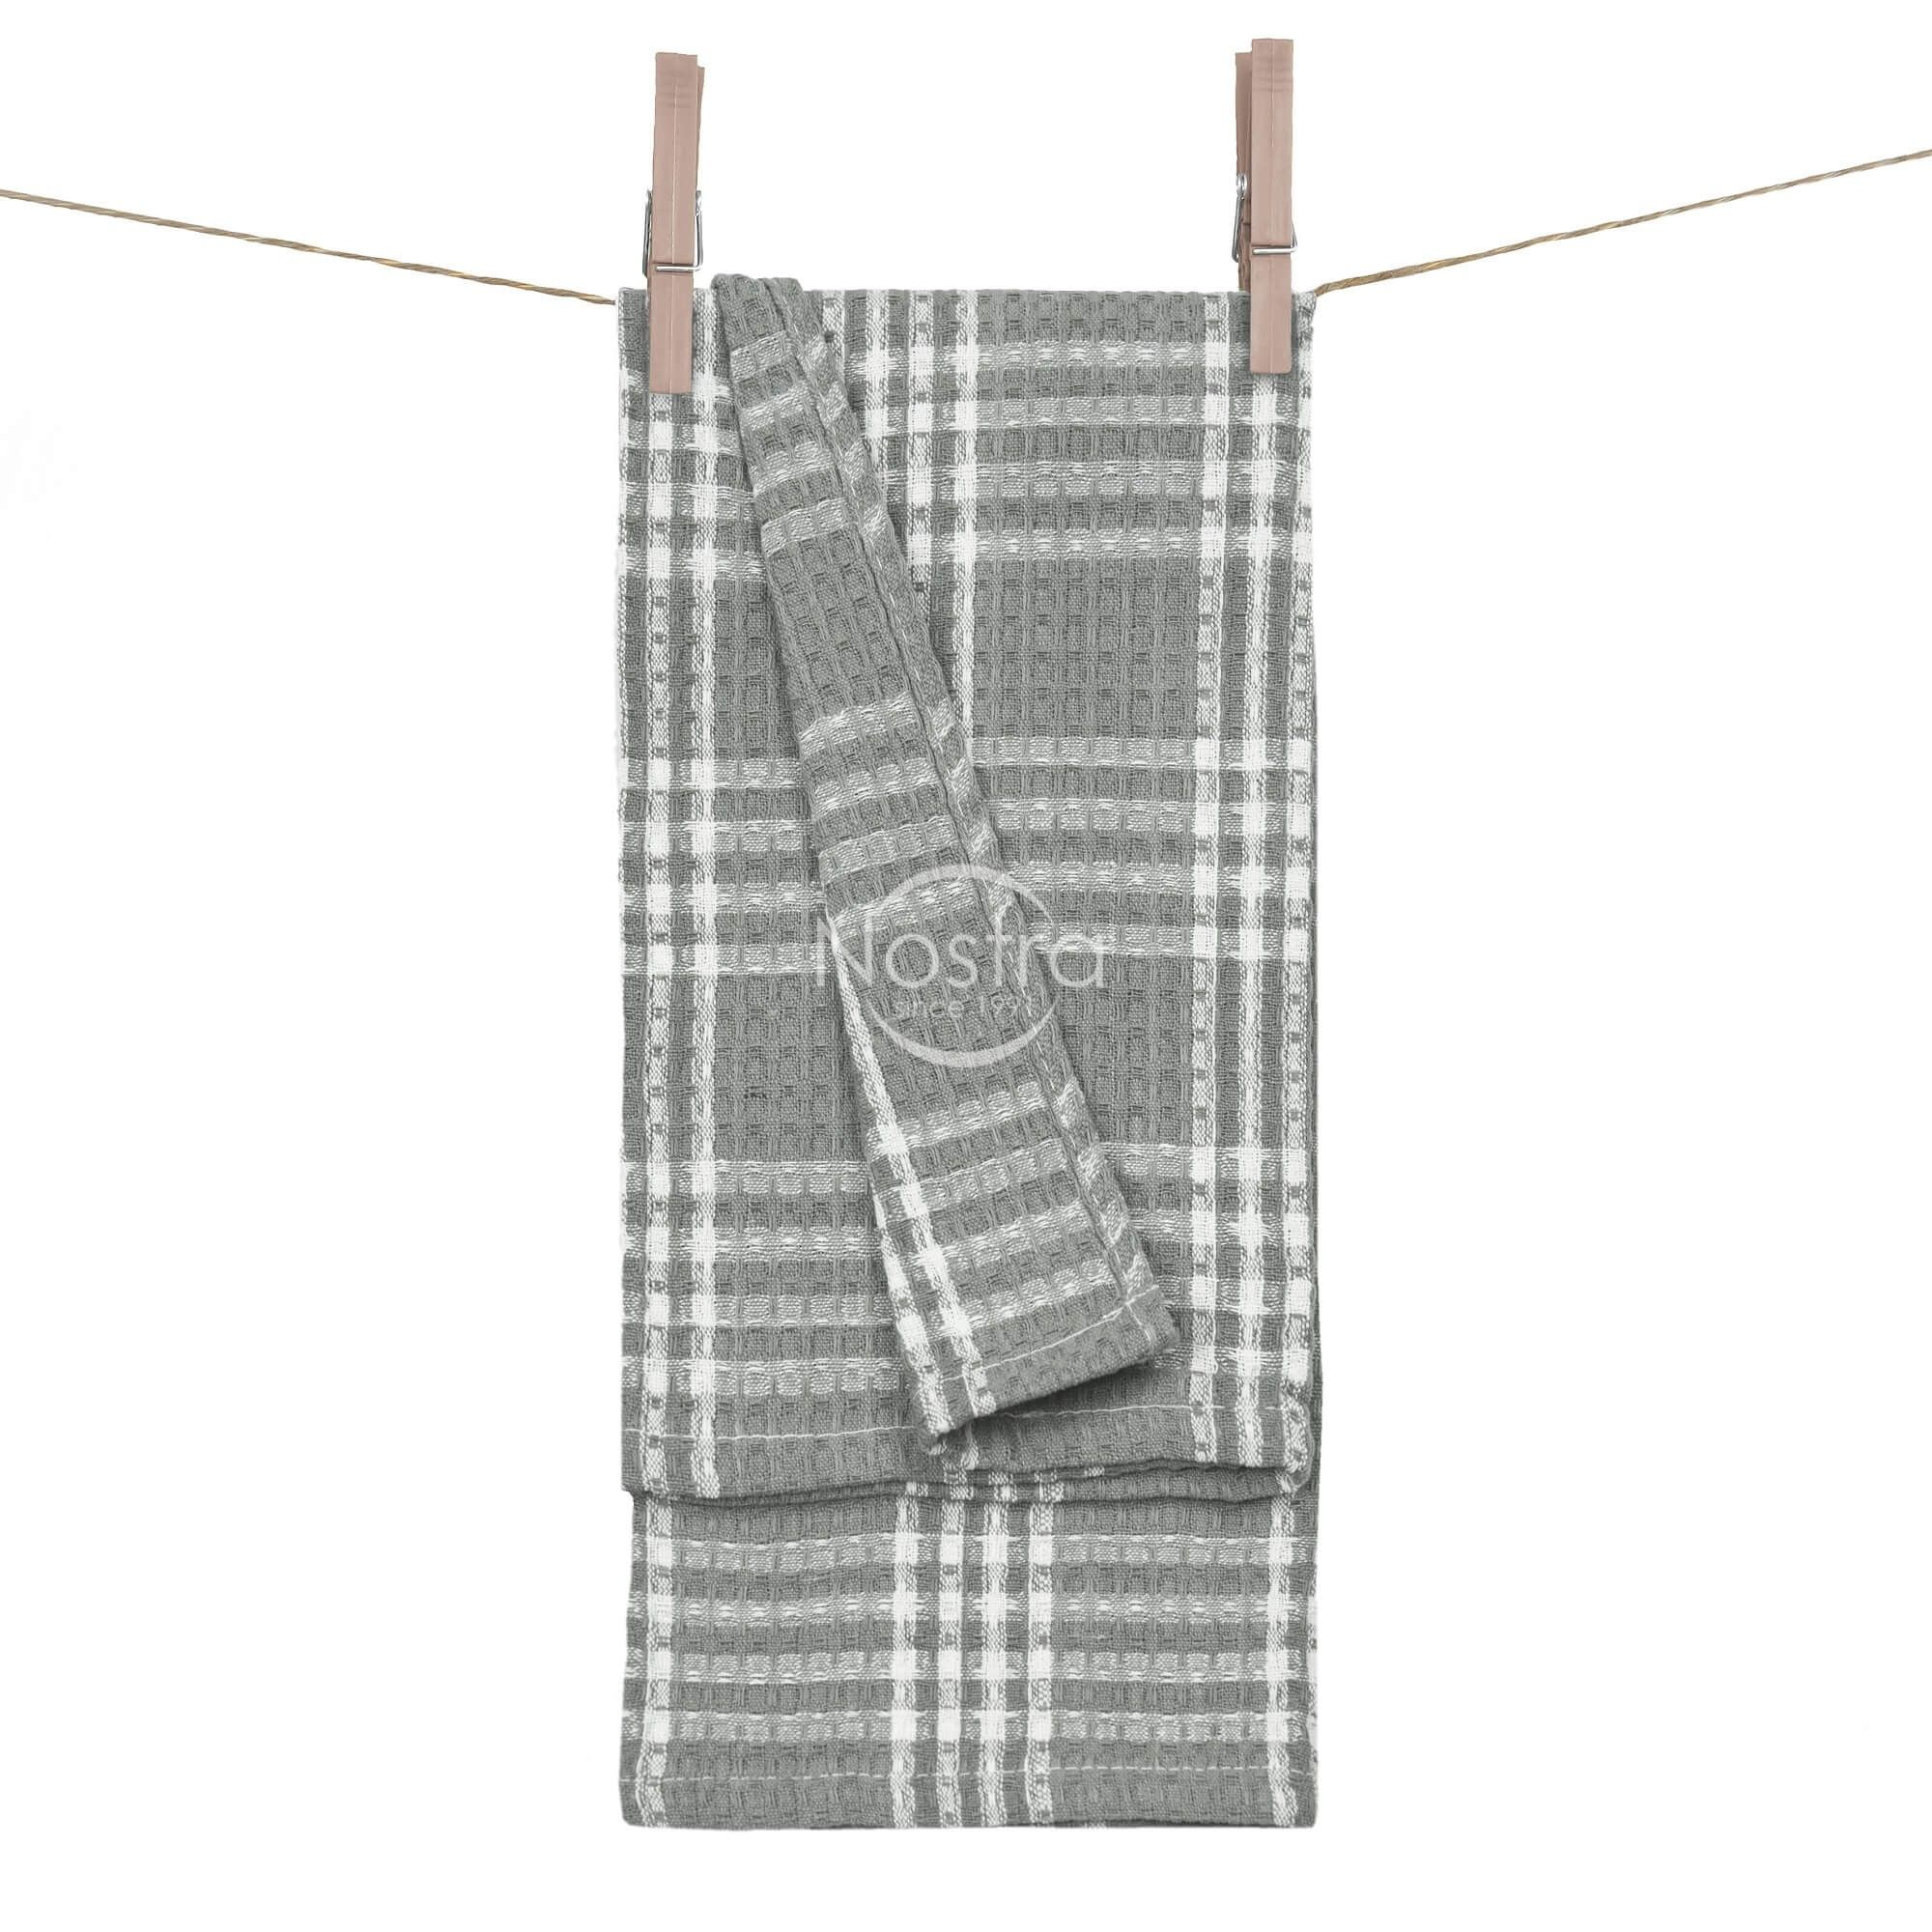 Virtuvinis rankšluostis WAFEL-240 T0101-GREY 50x70 cm